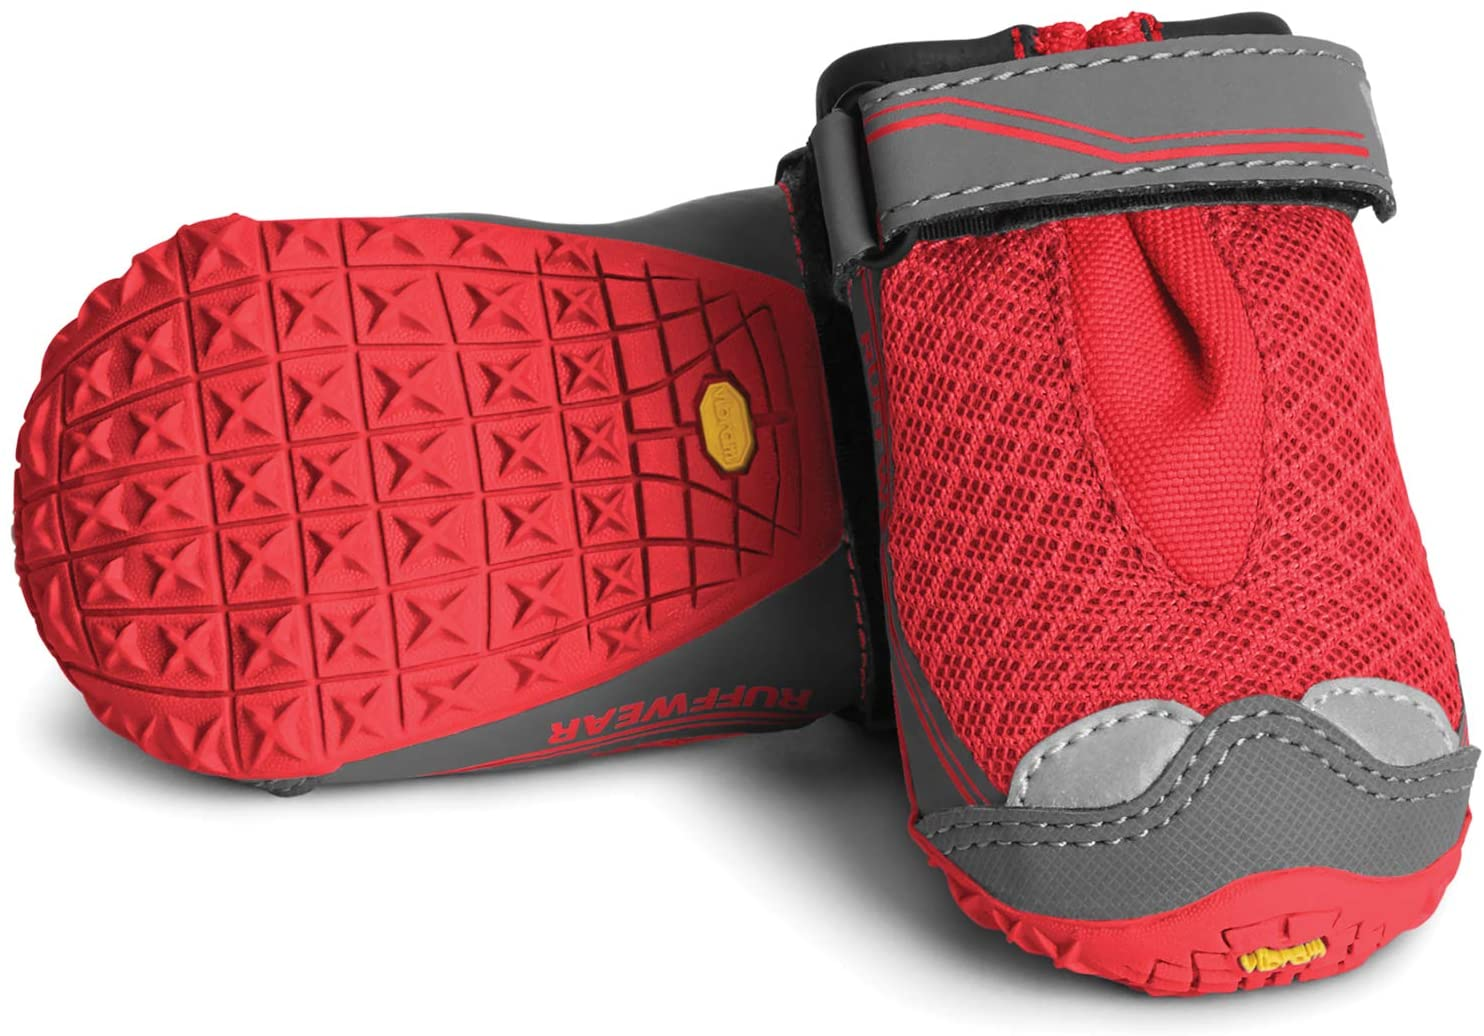 Ruffwear Grip Trex - set of 2 - Red Currant